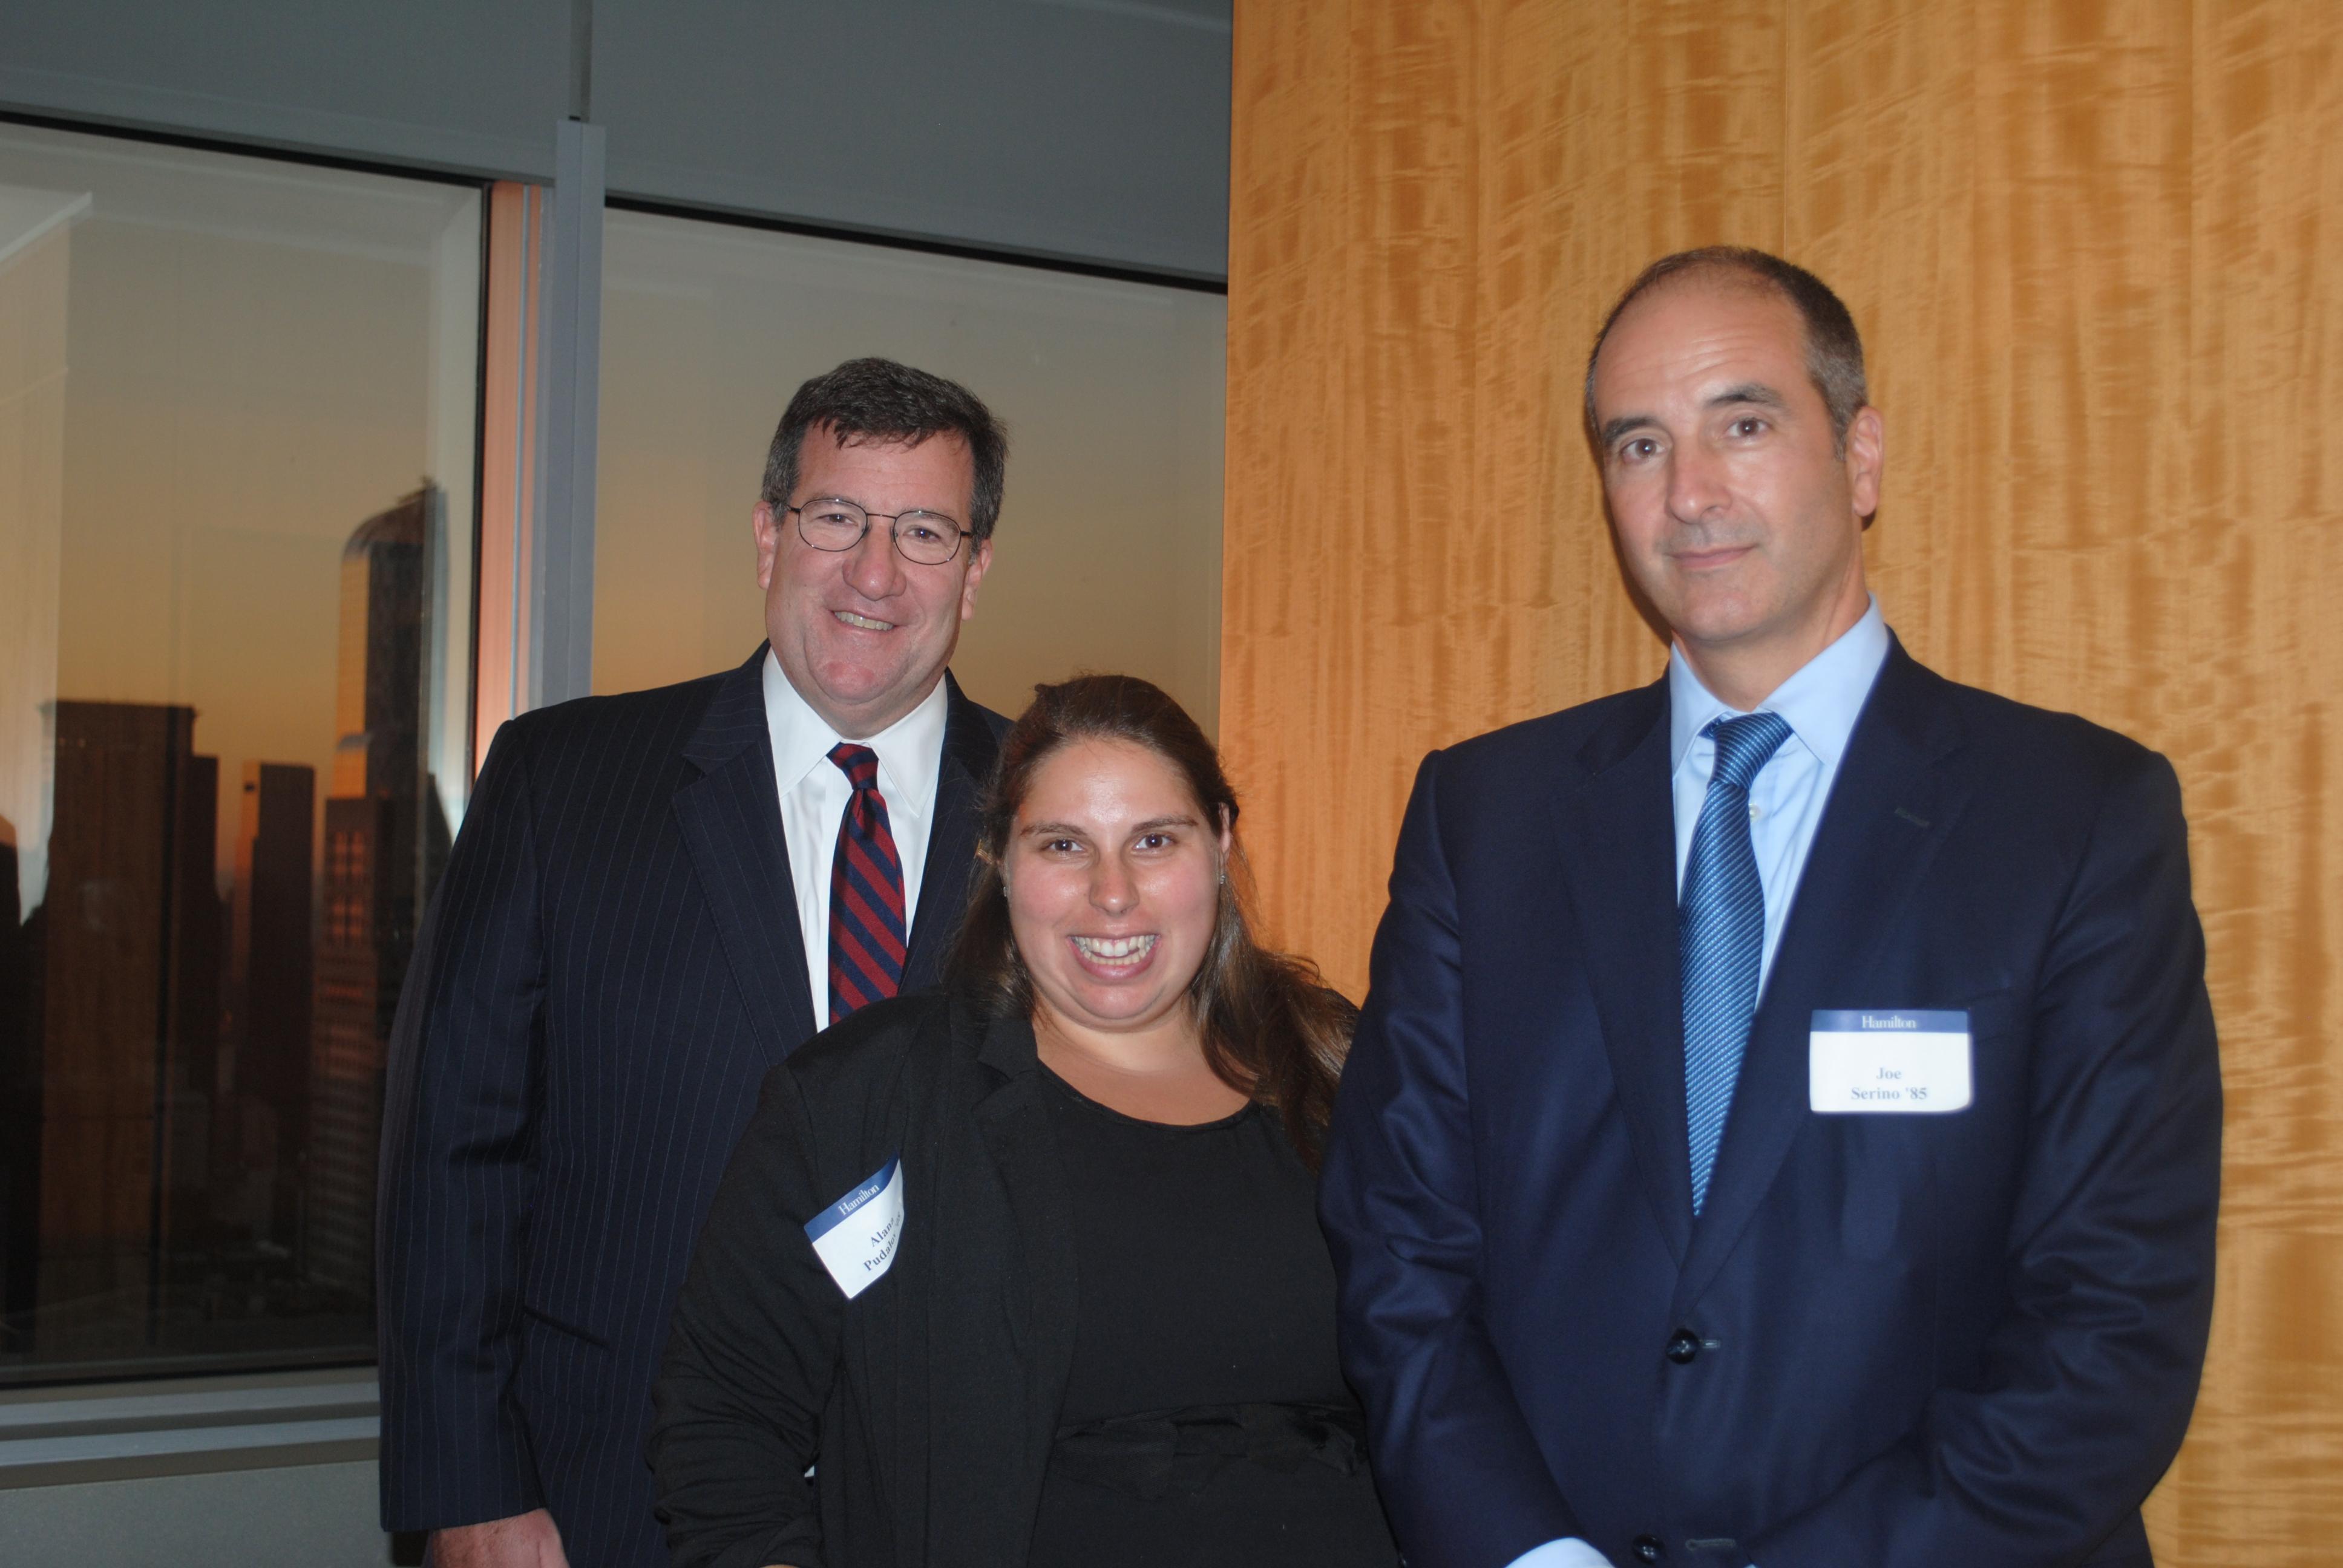 From left to right: Dan Connolly '85, P'18; Stacy Sadove '07; Joe Serino '85